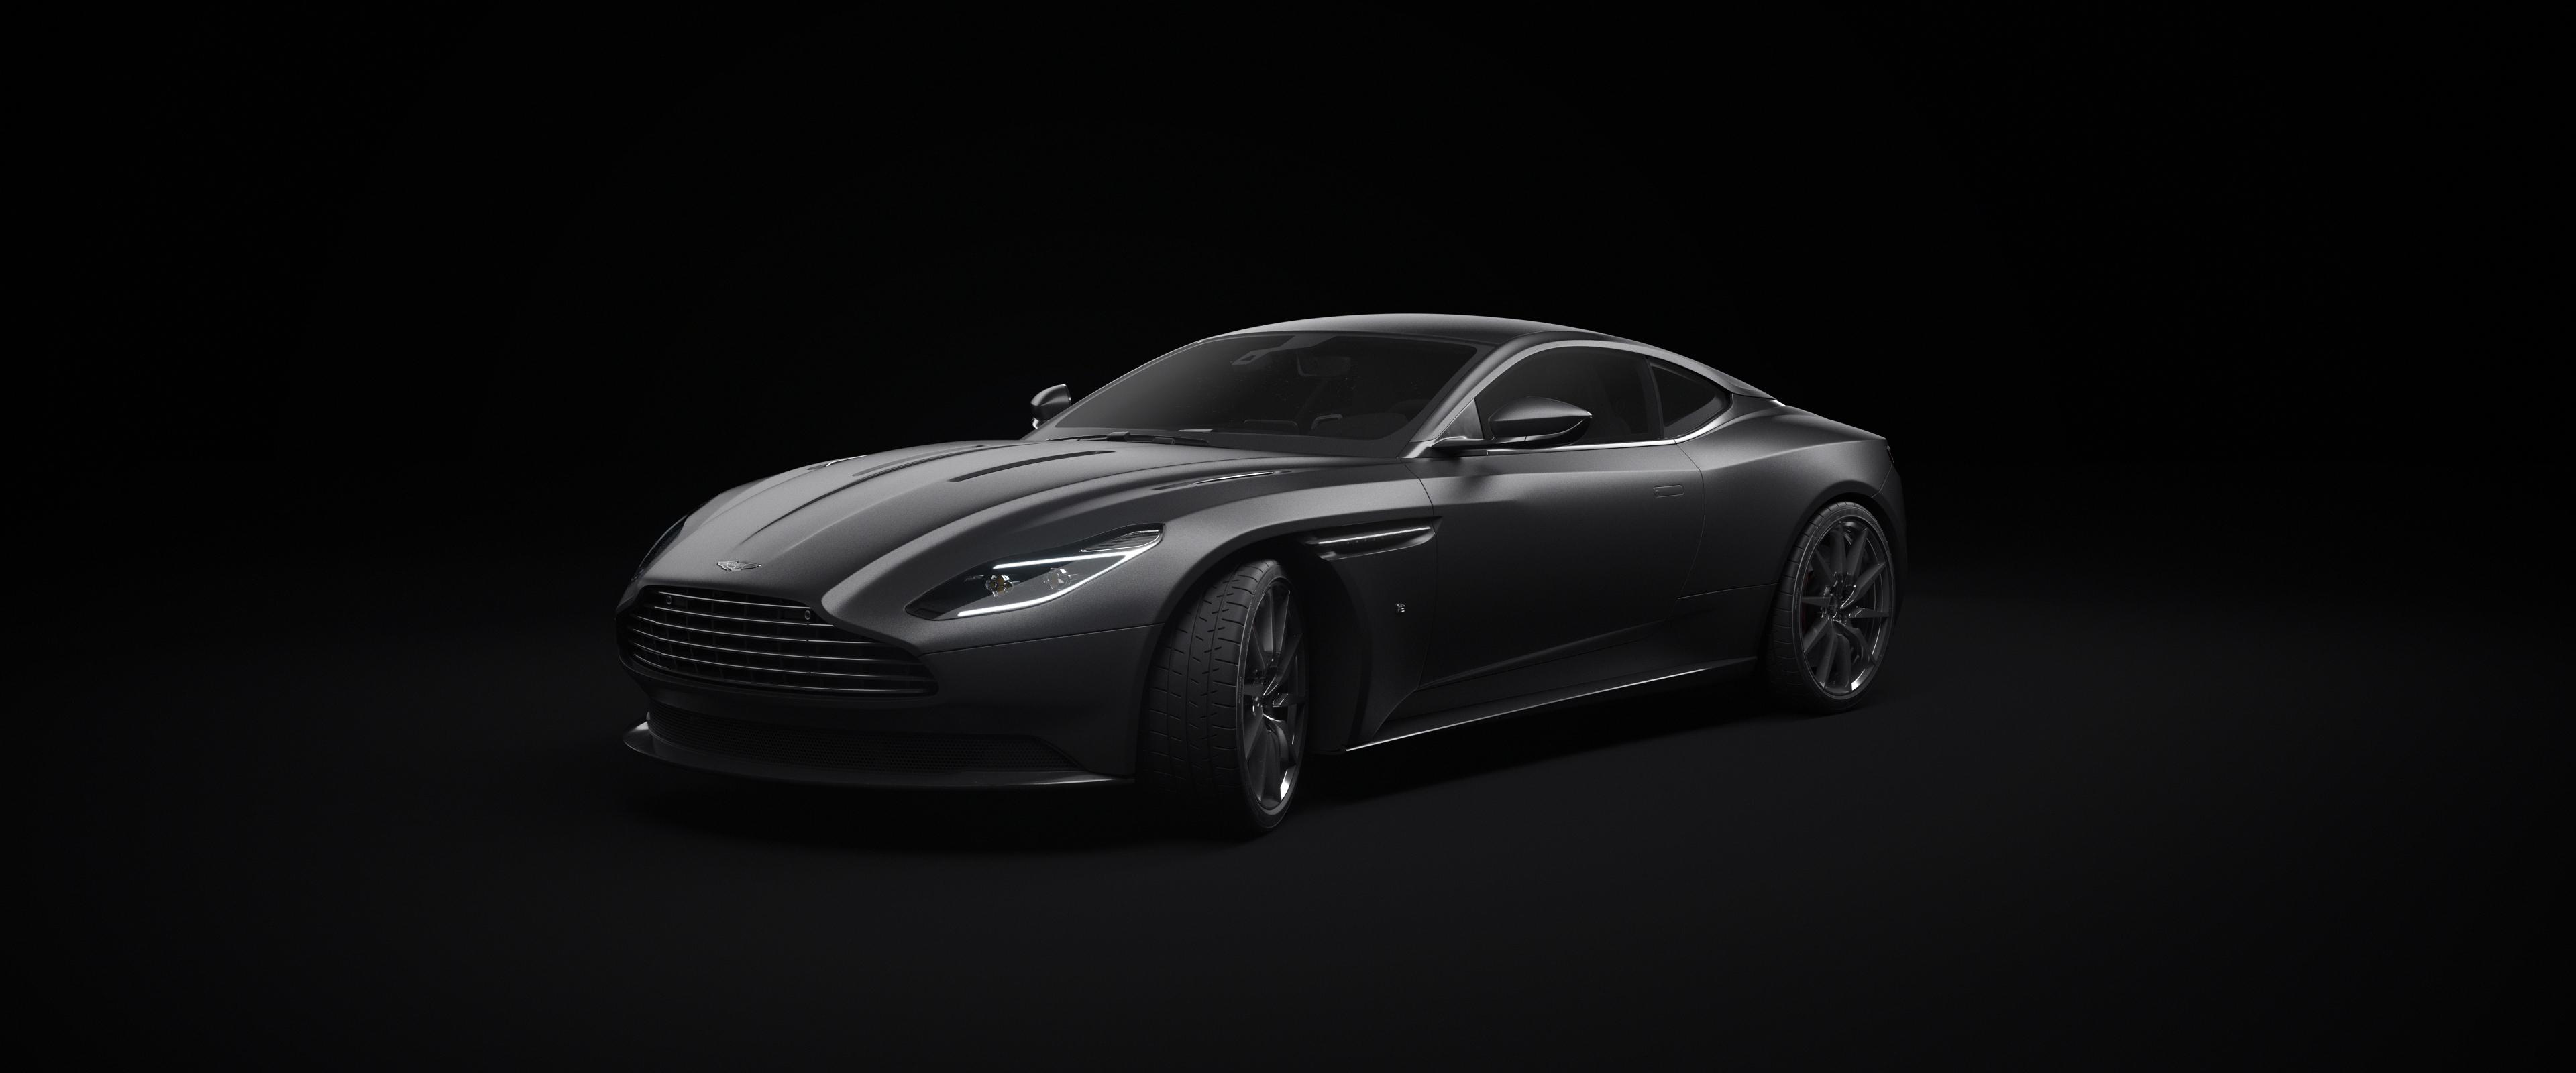 Aston Martin DB11 2017 - 3/4th